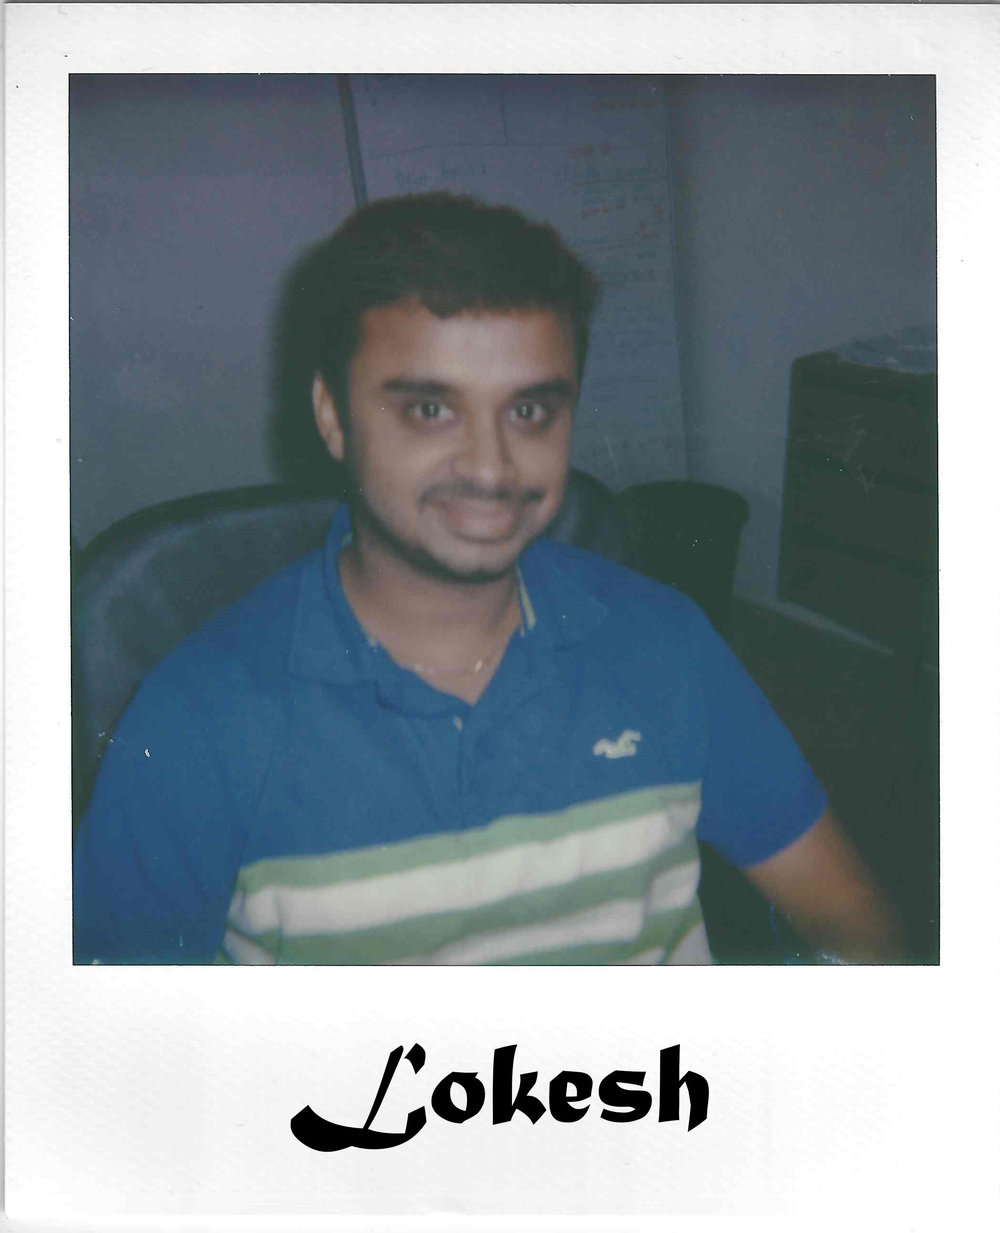 Polaroid_Lokesh.jpg